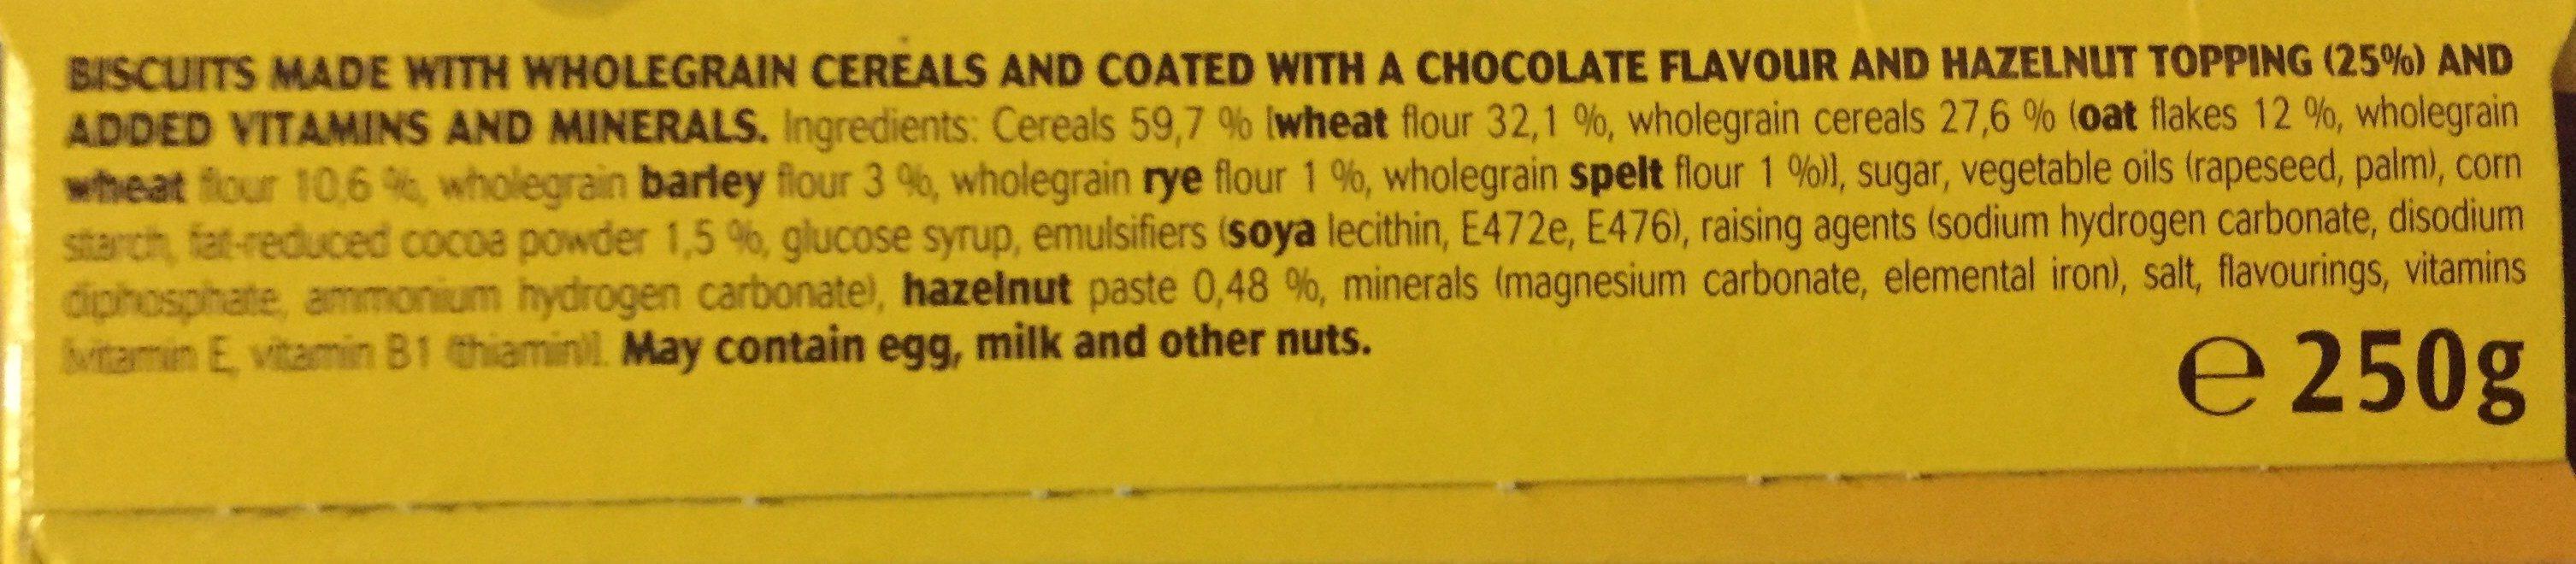 Breakfast Biscuits Tops Choco Hazelnuts 5 Packs - Ingrédients - fr